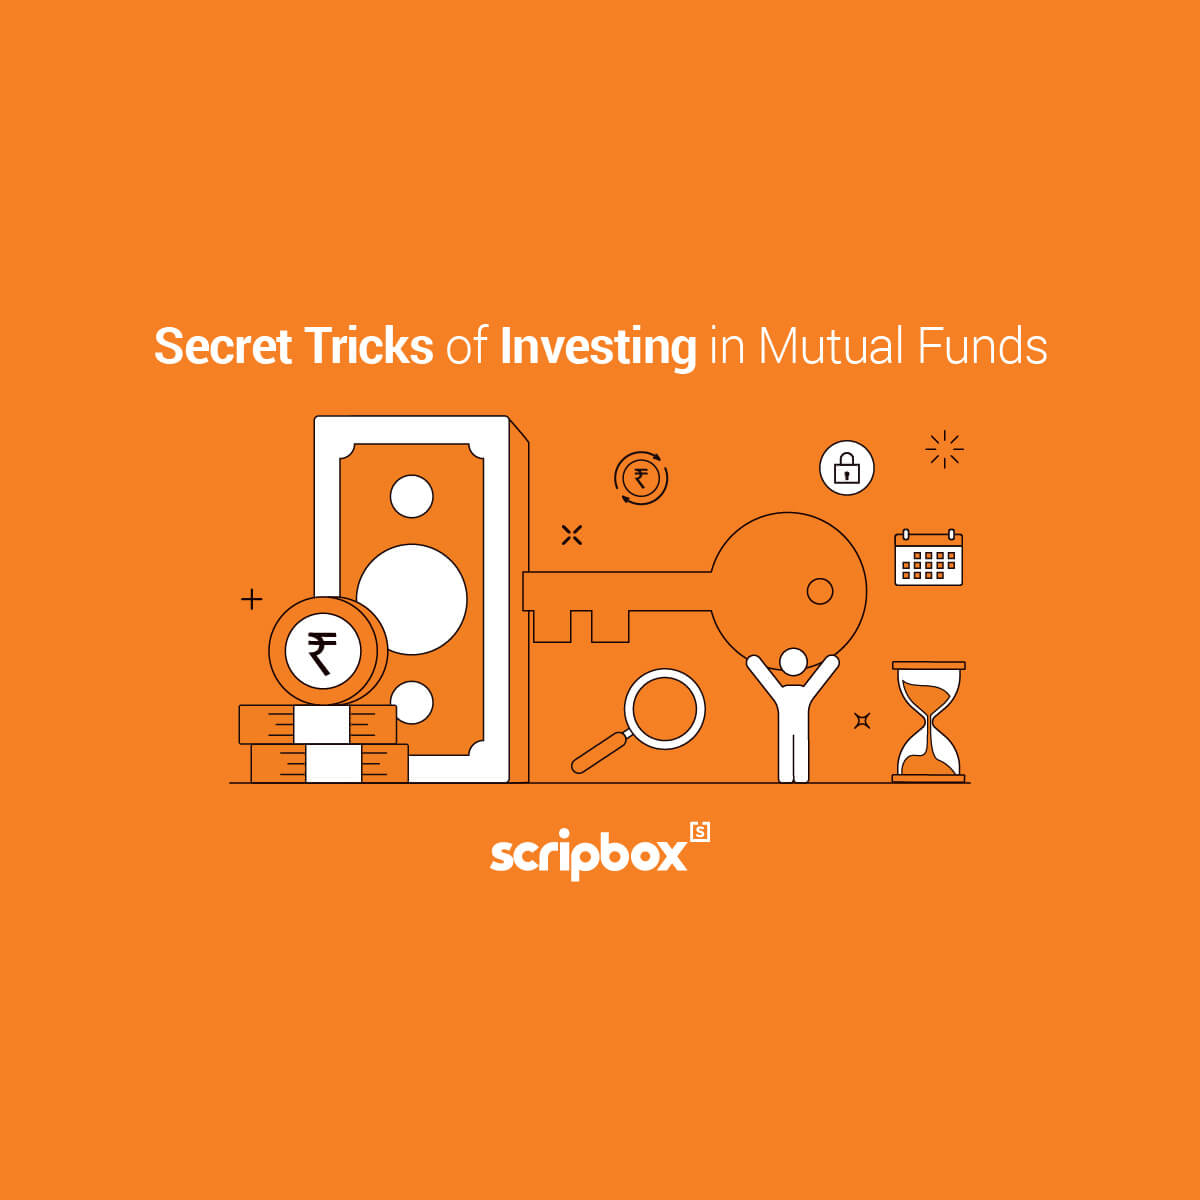 secret trick of investing